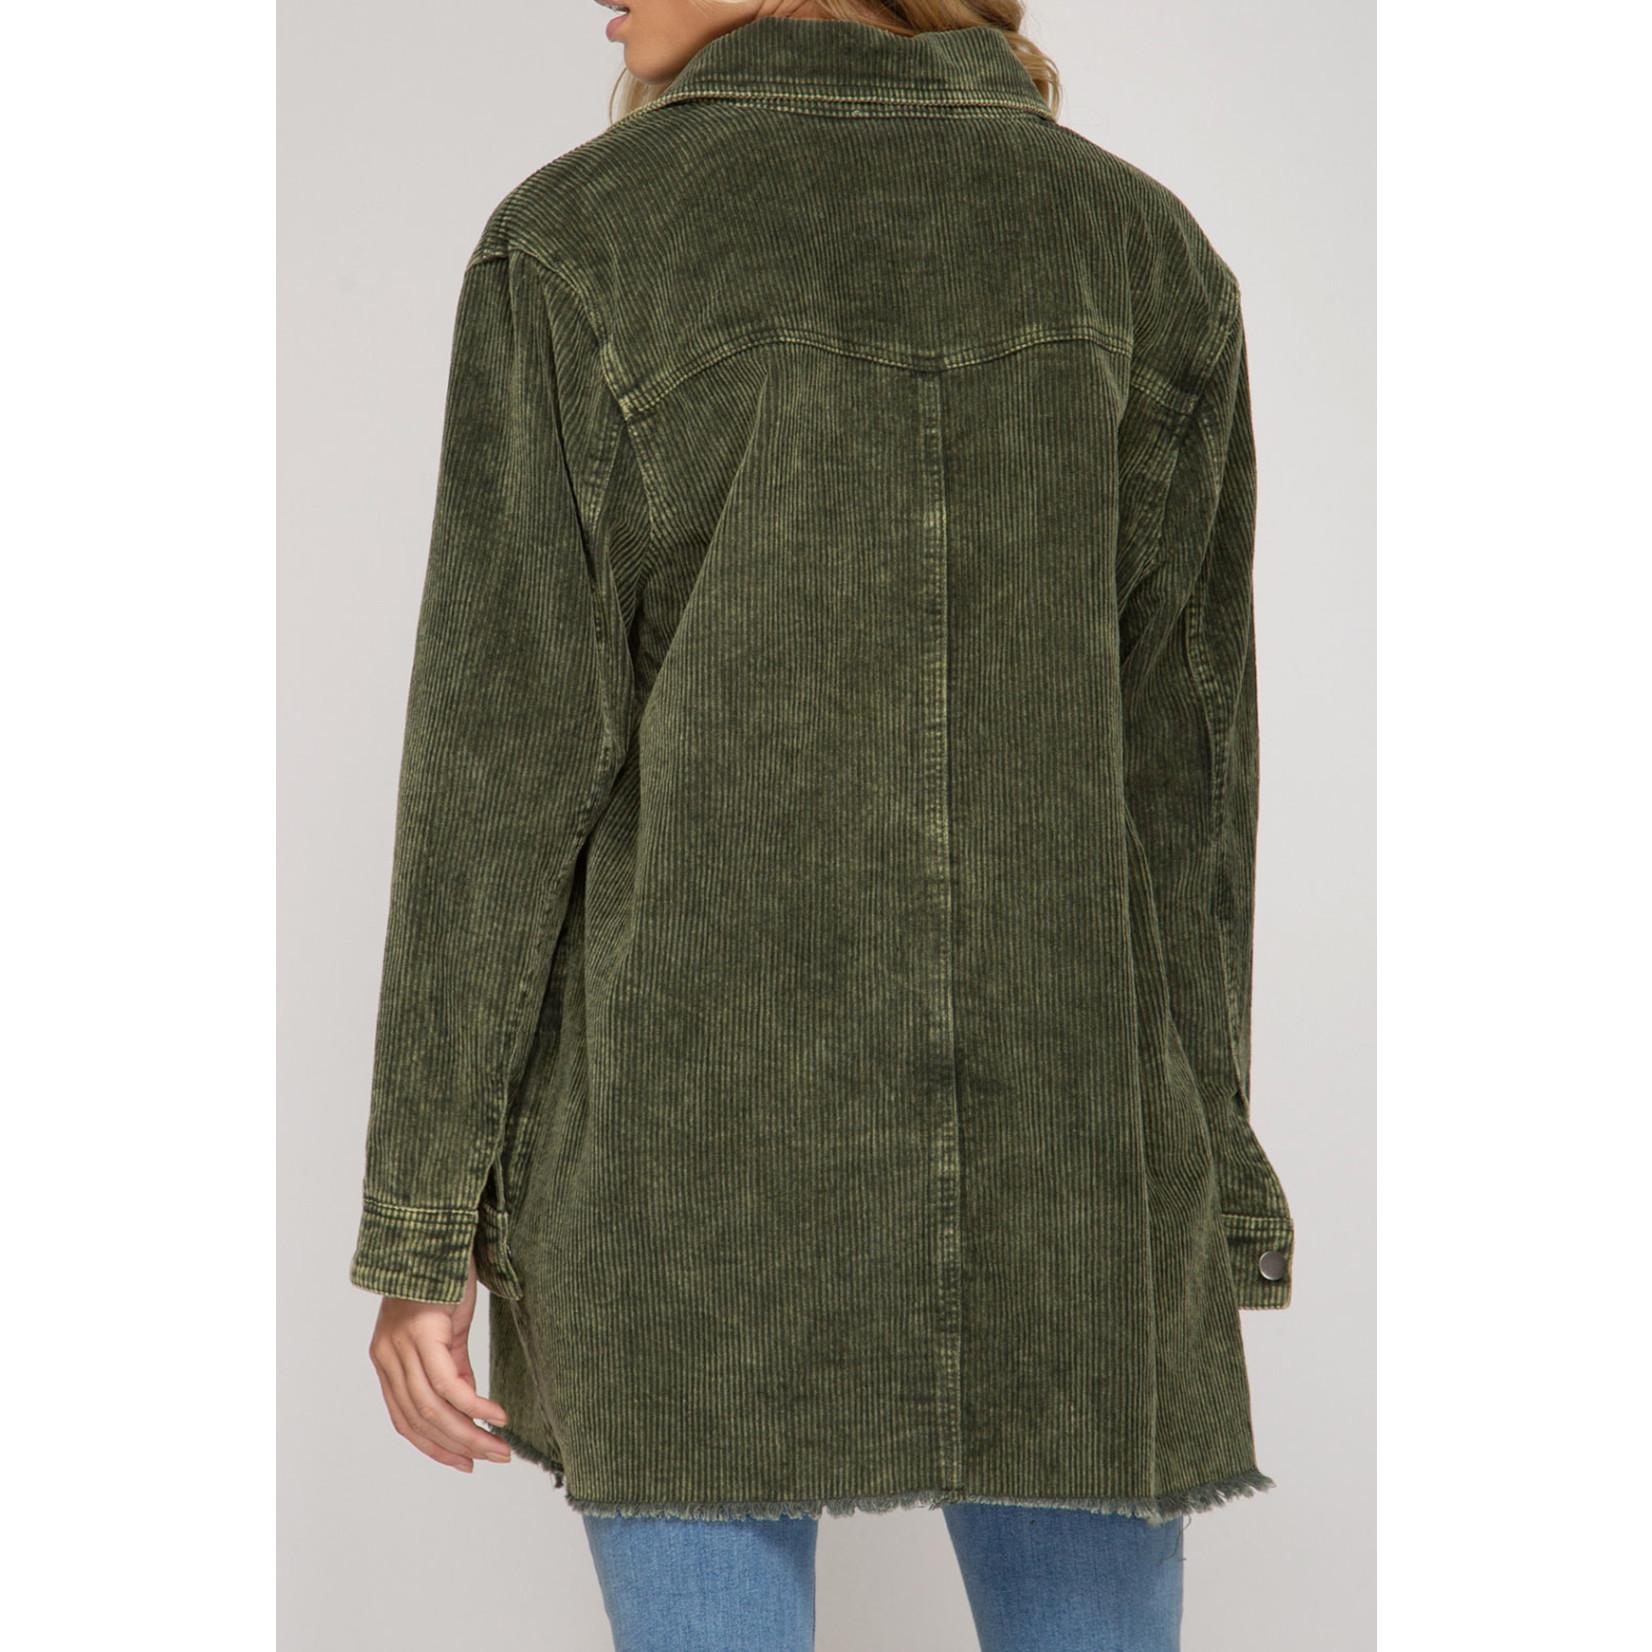 She & Sky Corduroy Button Down Shirt/Jacket